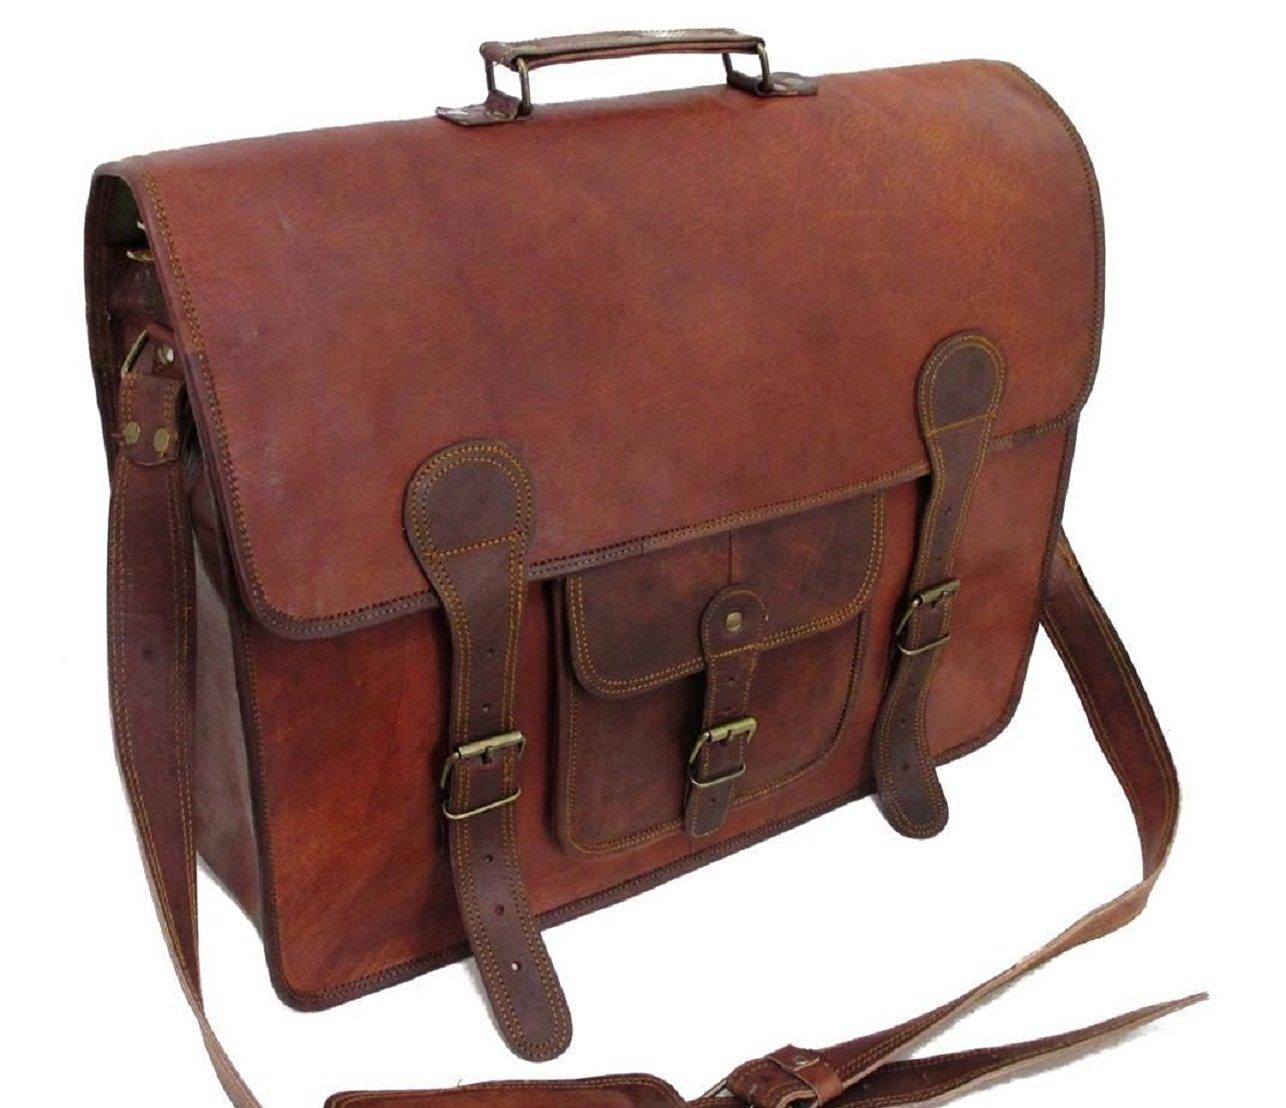 Phoenix Craft Men's Large Genuine Vintage Brown Leather Messenger Bag Shoulder Laptop Bag Briefcase 18X13X6 Inches Brown …